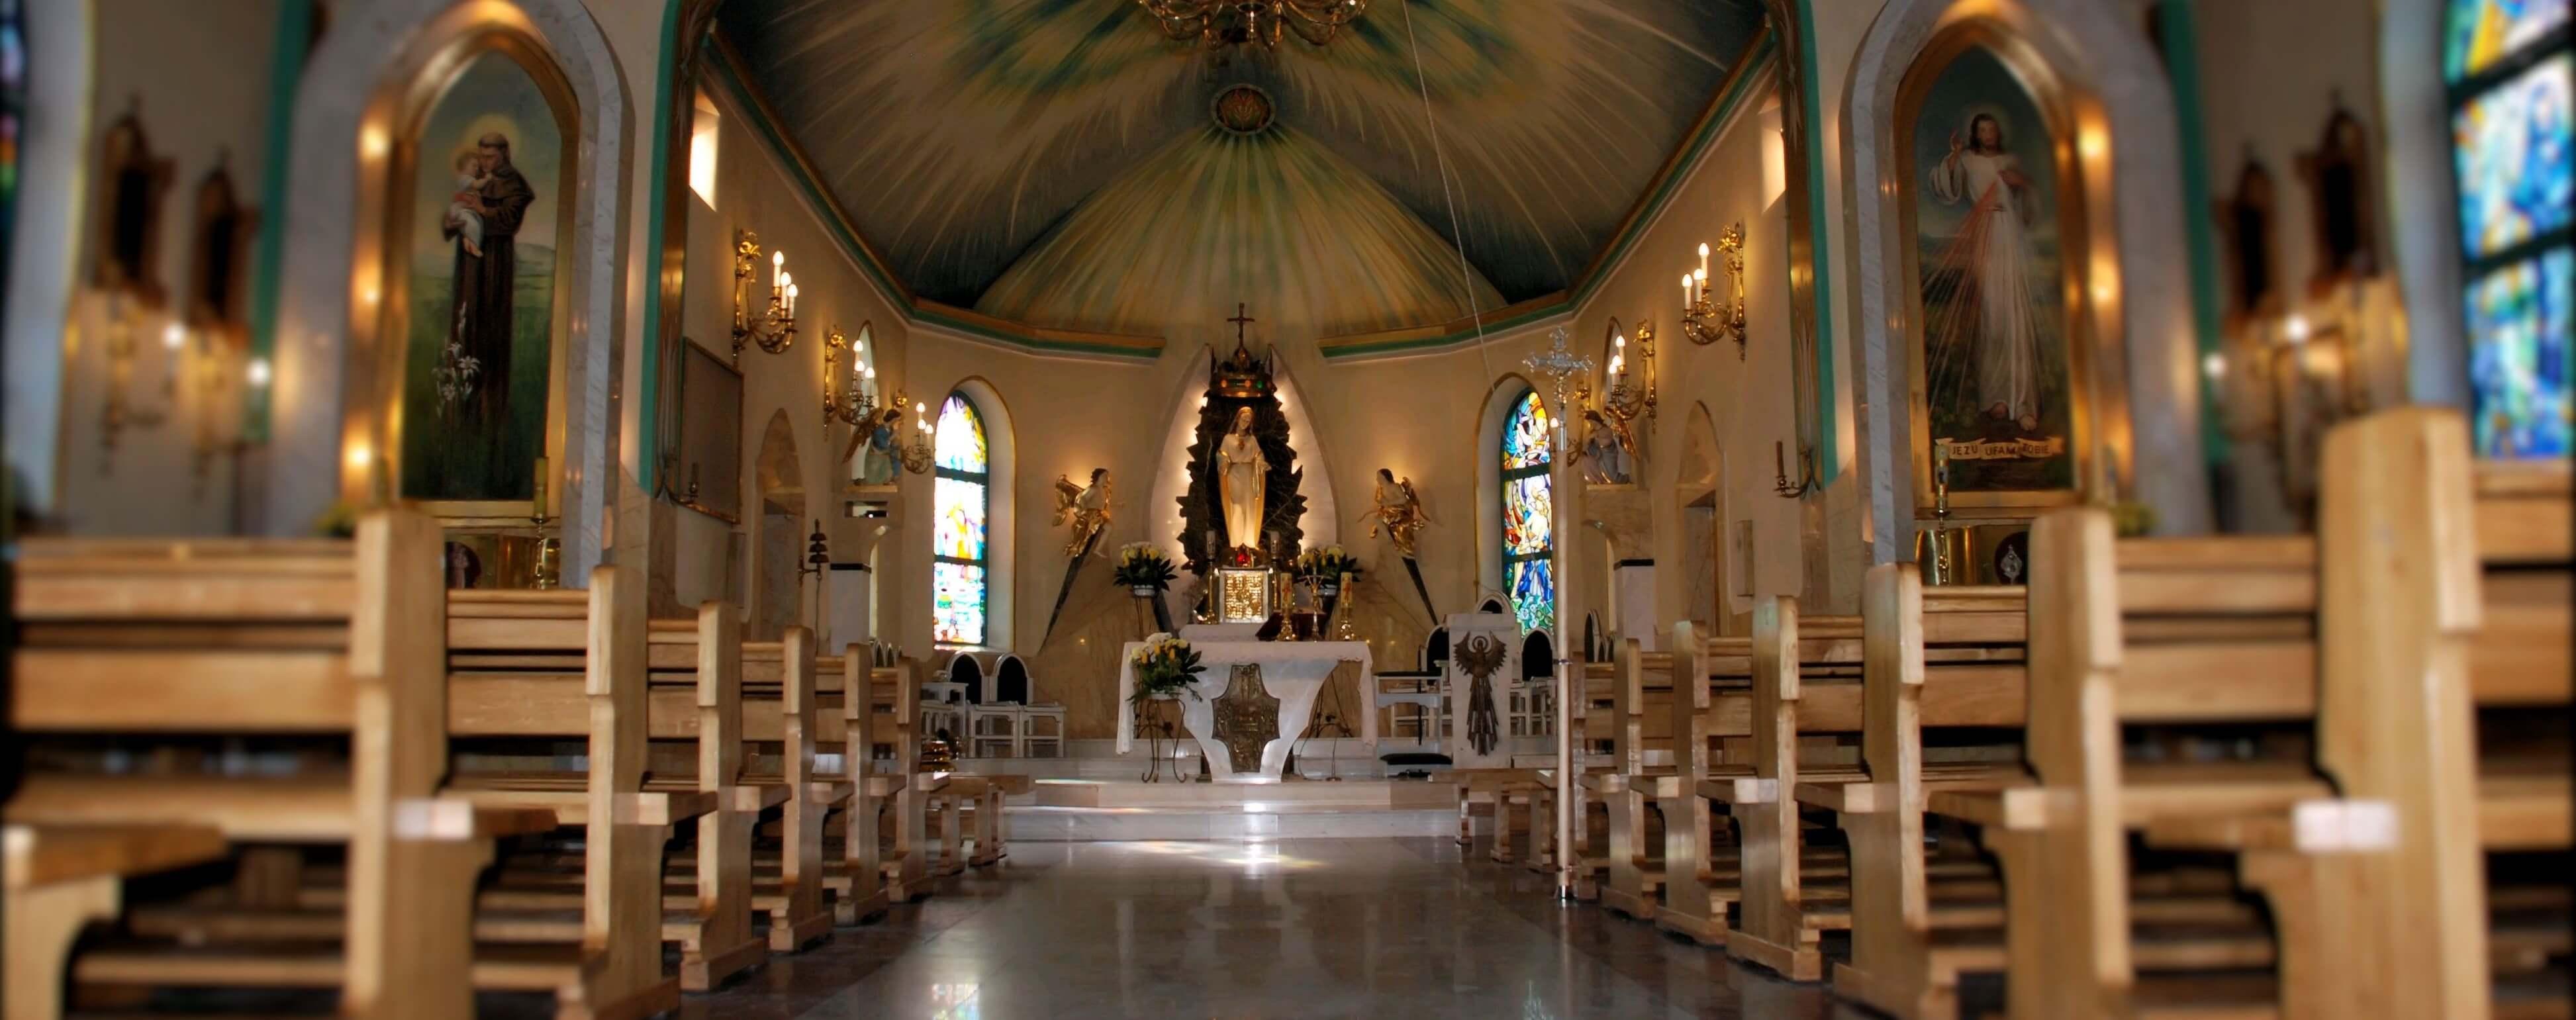 Parafia Krzyzowa-Banner